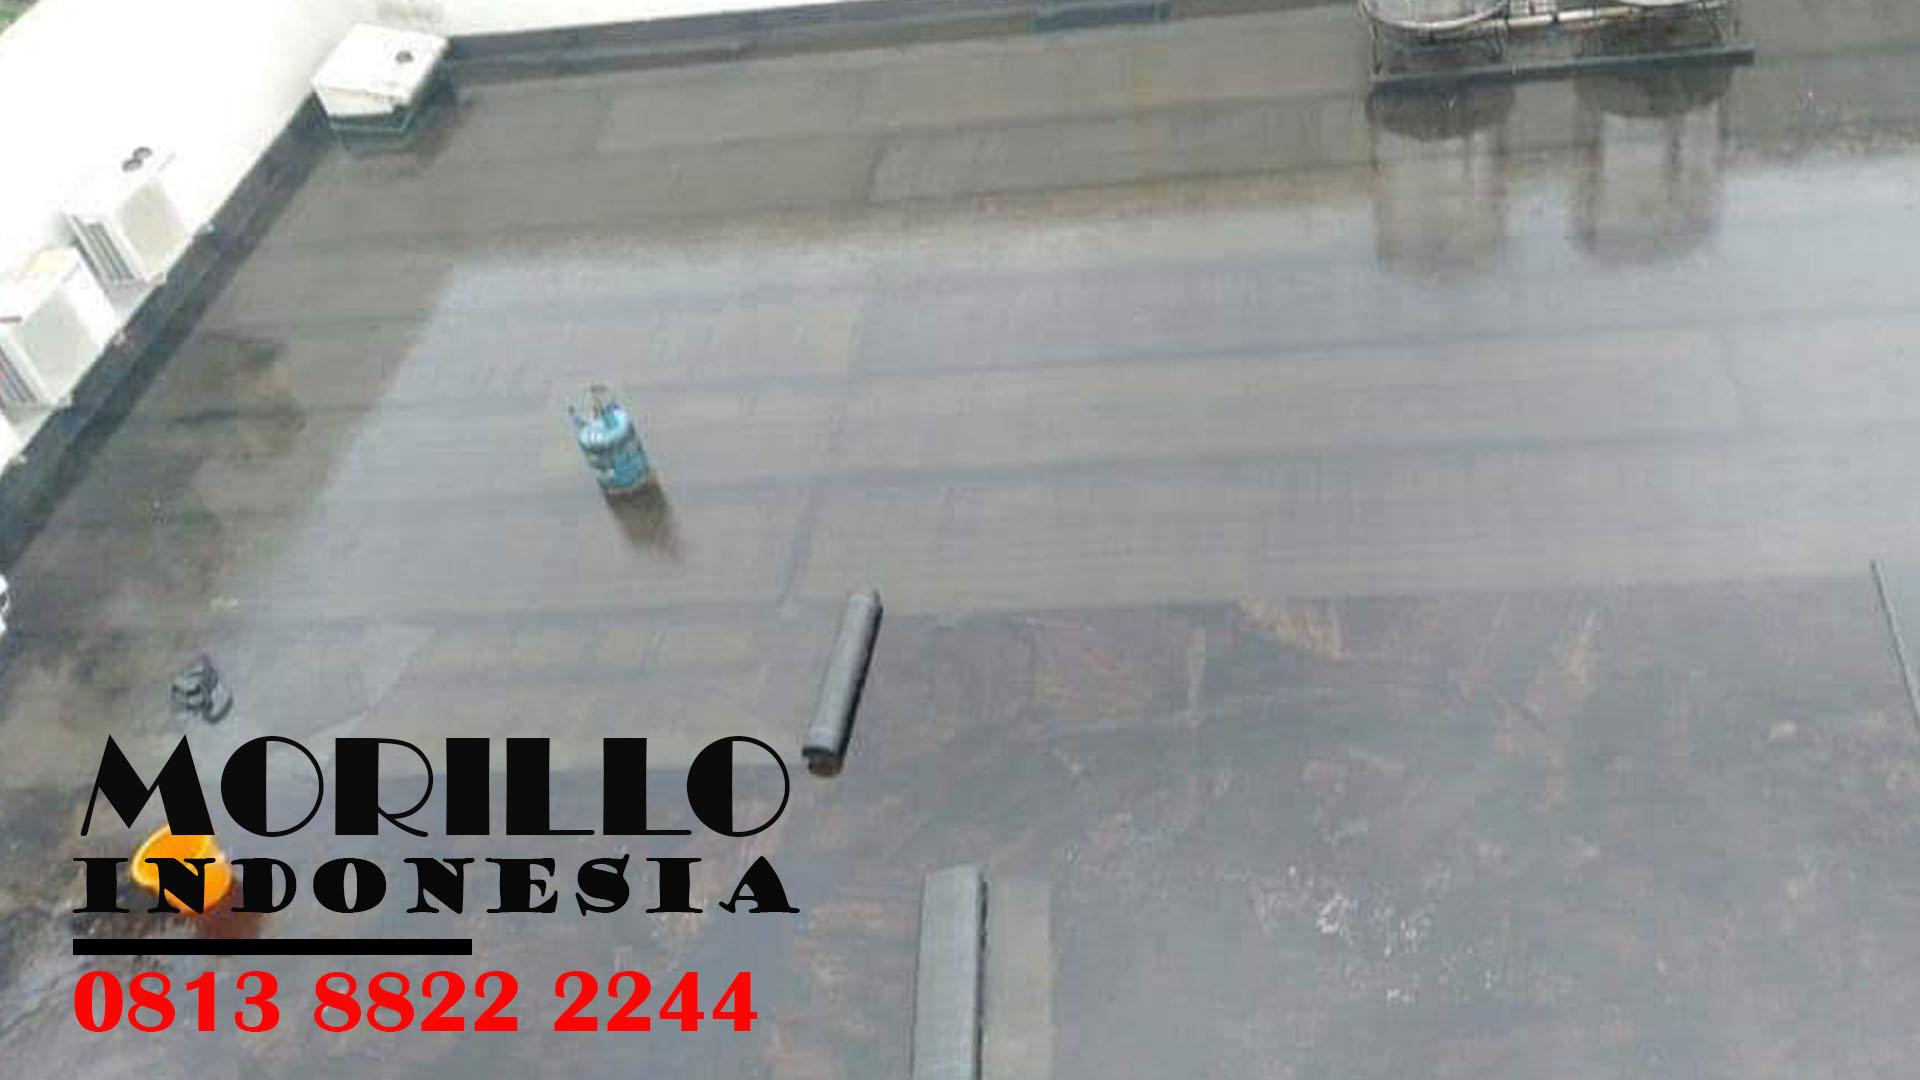 MEMBRAN BAKAR MURAH di JAKARTA PUSAT TELEPON KAMI : 0813 88222244